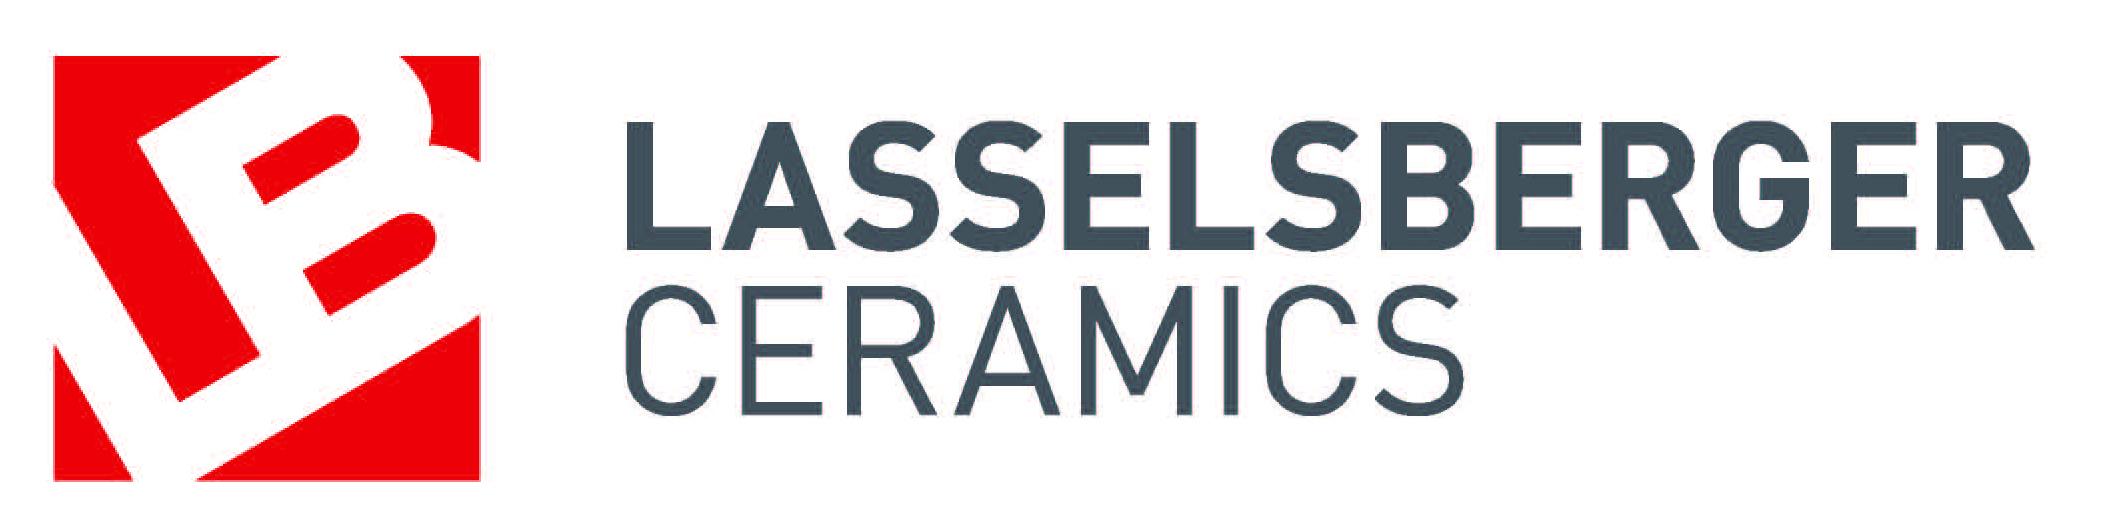 logo_LASSELSBERGER_CERAMICS